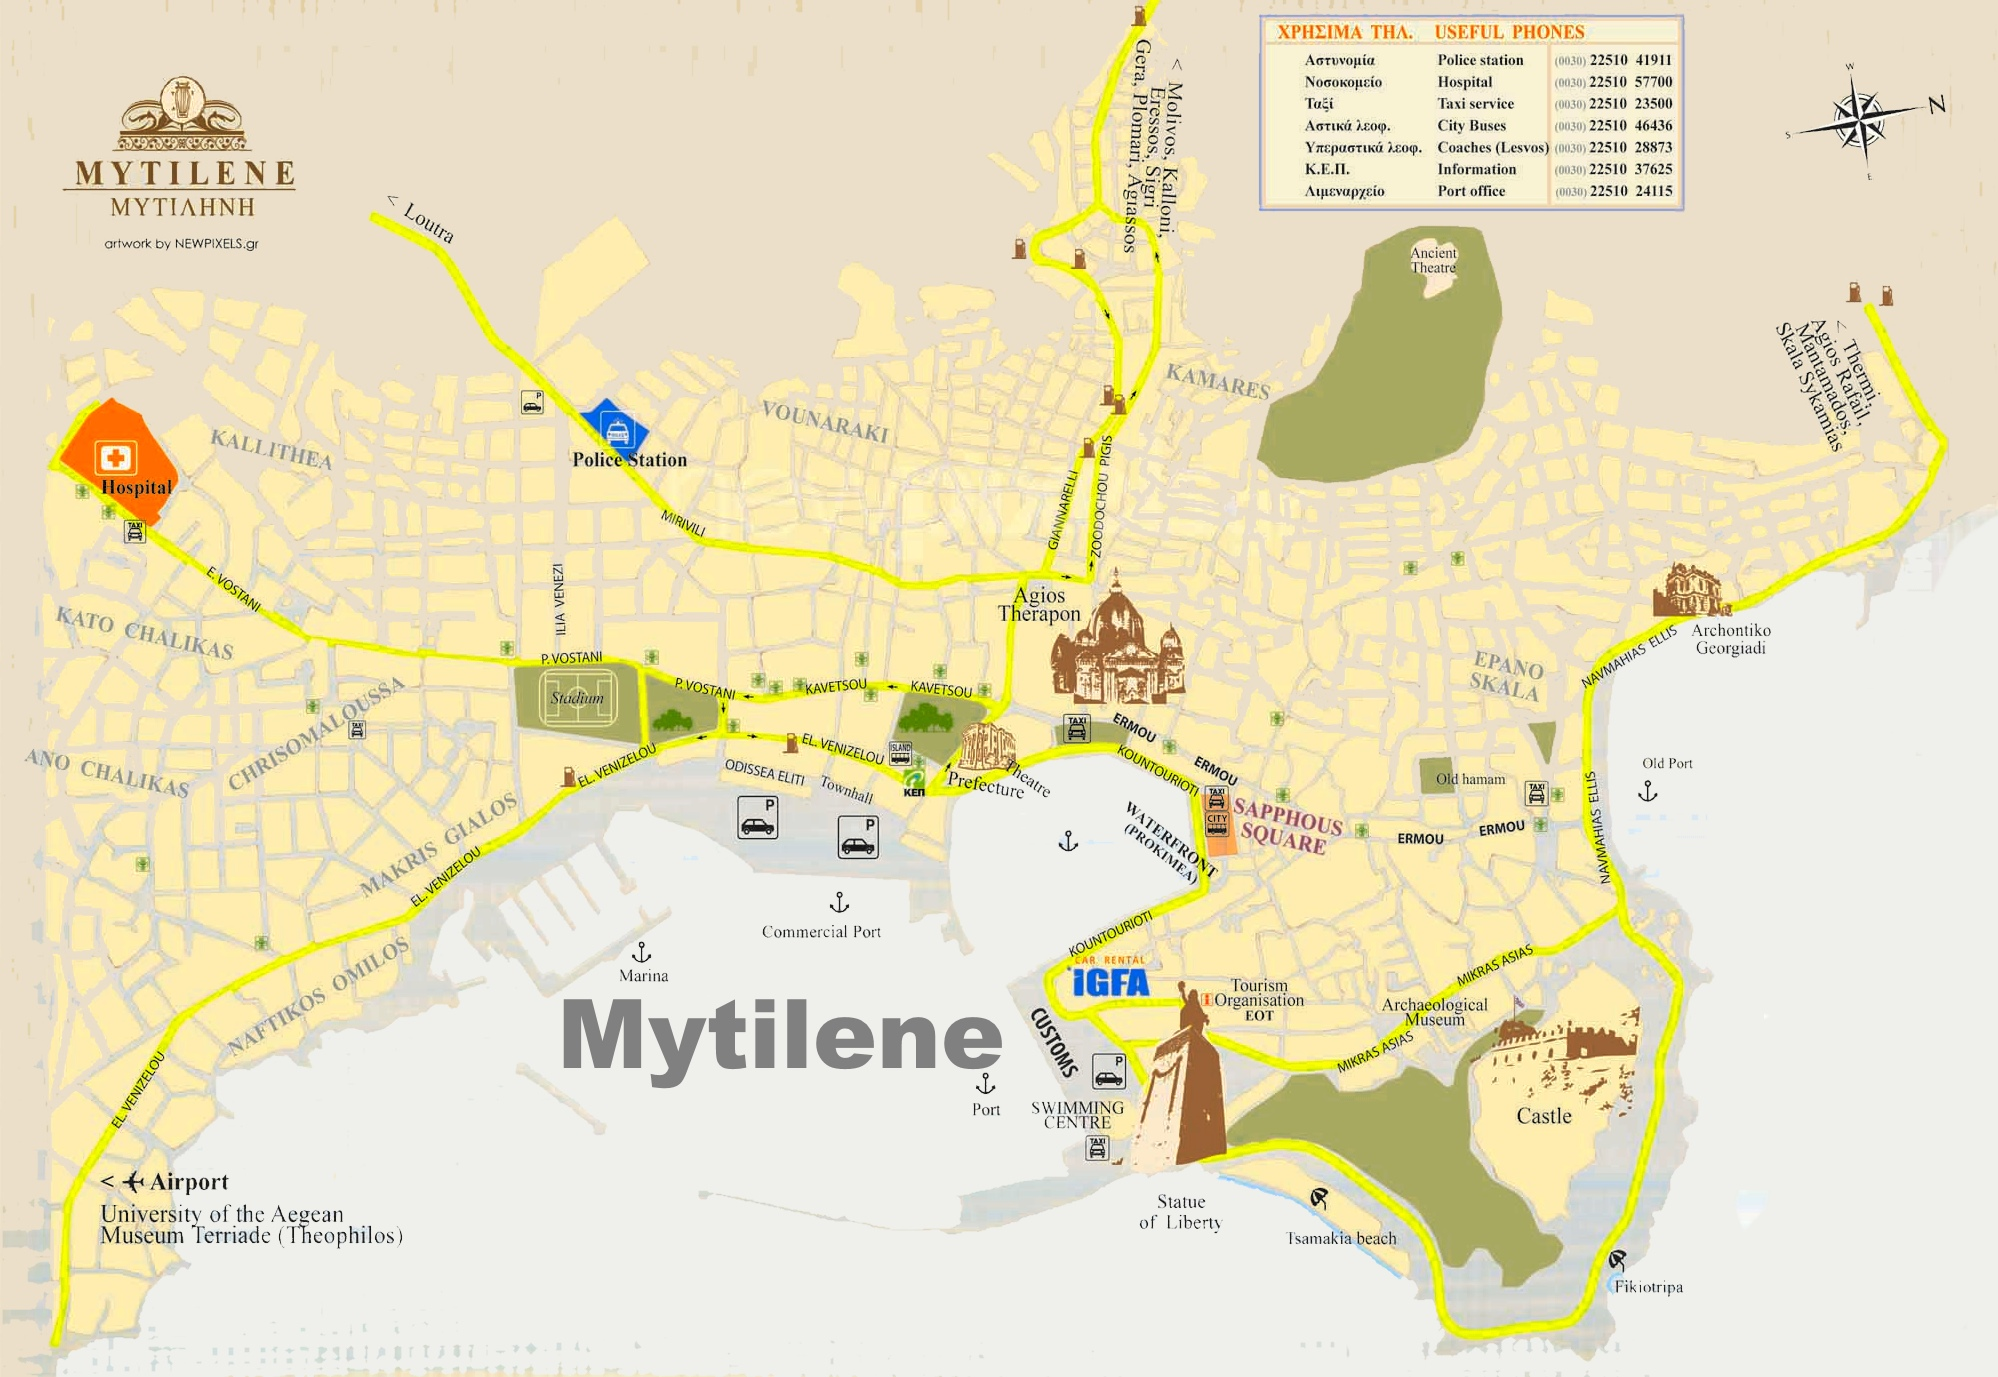 Mytilene tourist map